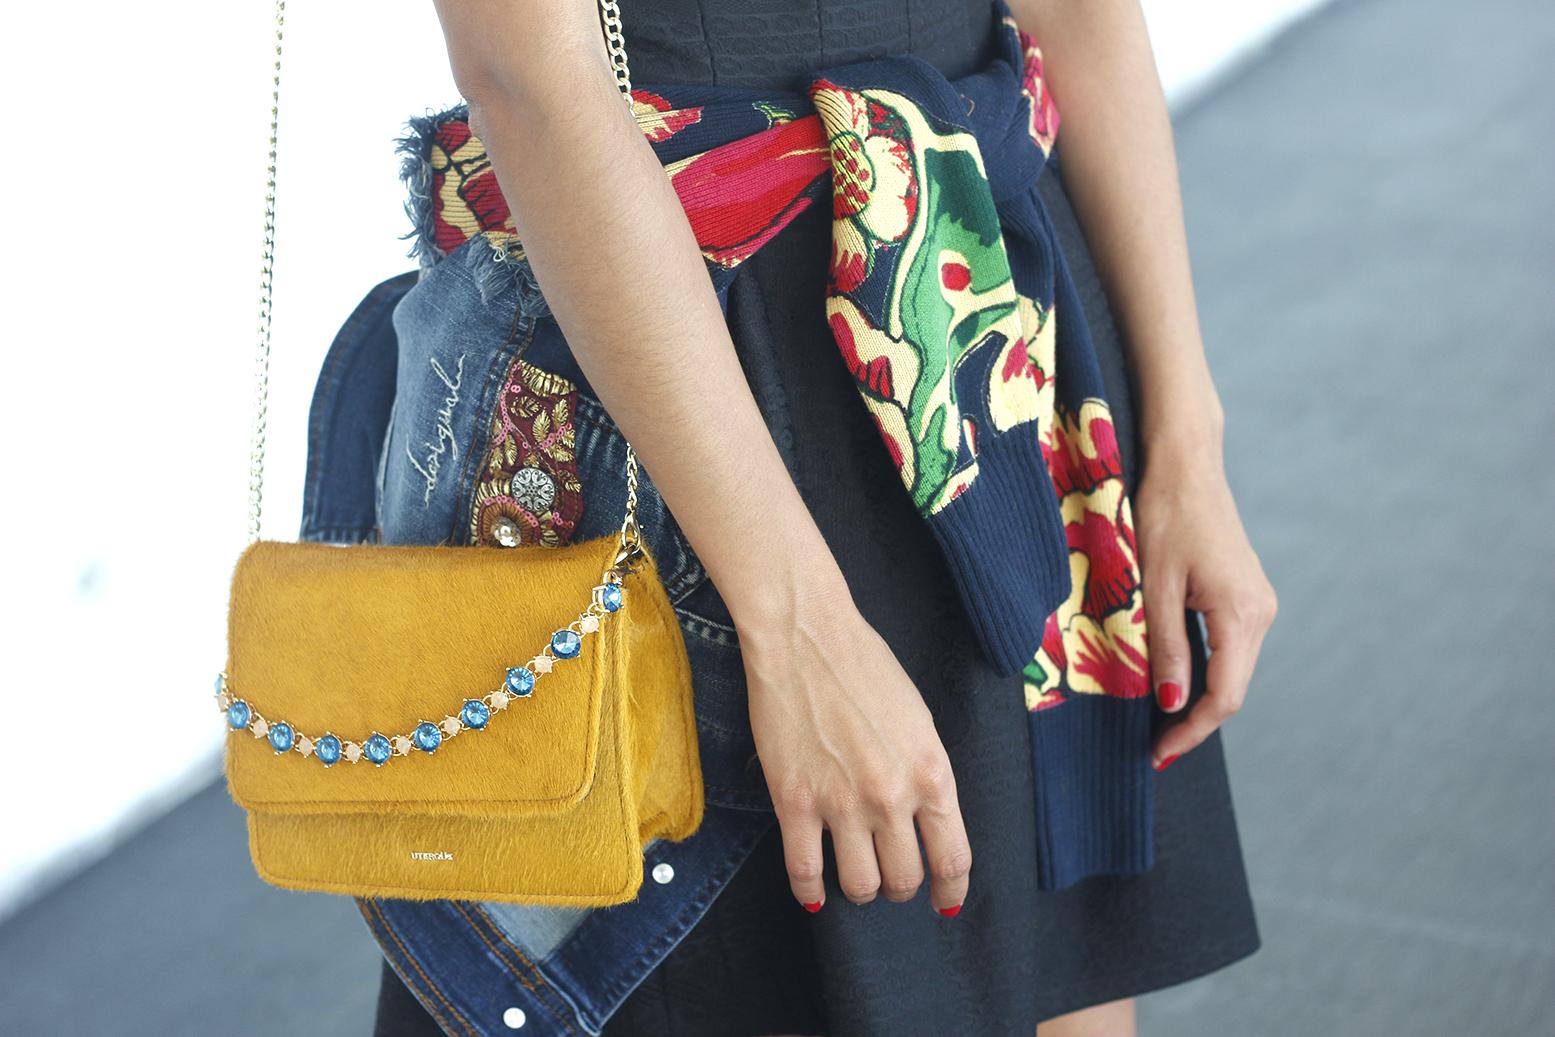 desigual black dress and denim jacket for fashion week madrid outfit fashion10